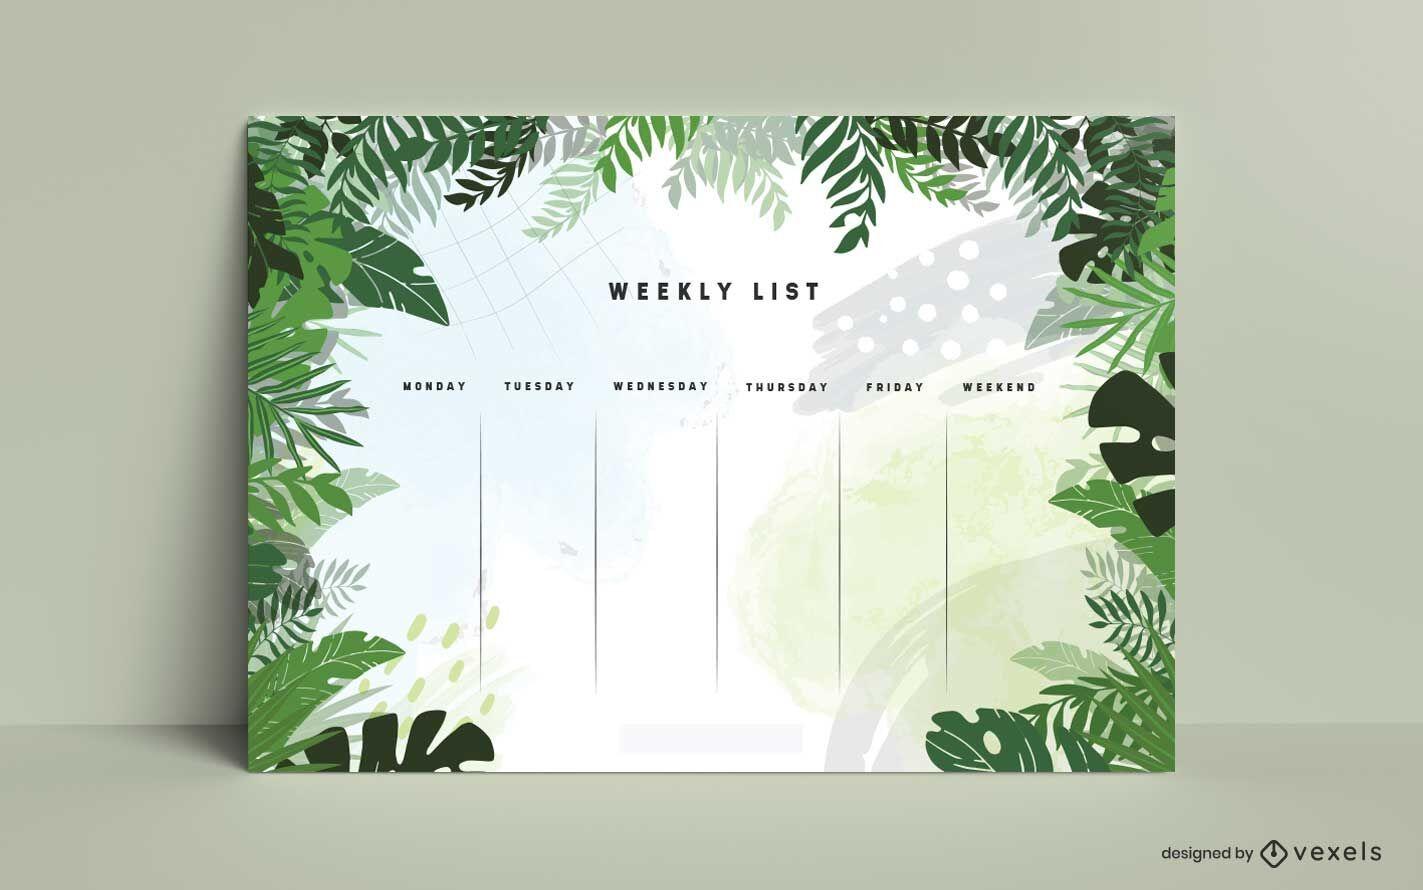 Jungle leaves weekly planner design